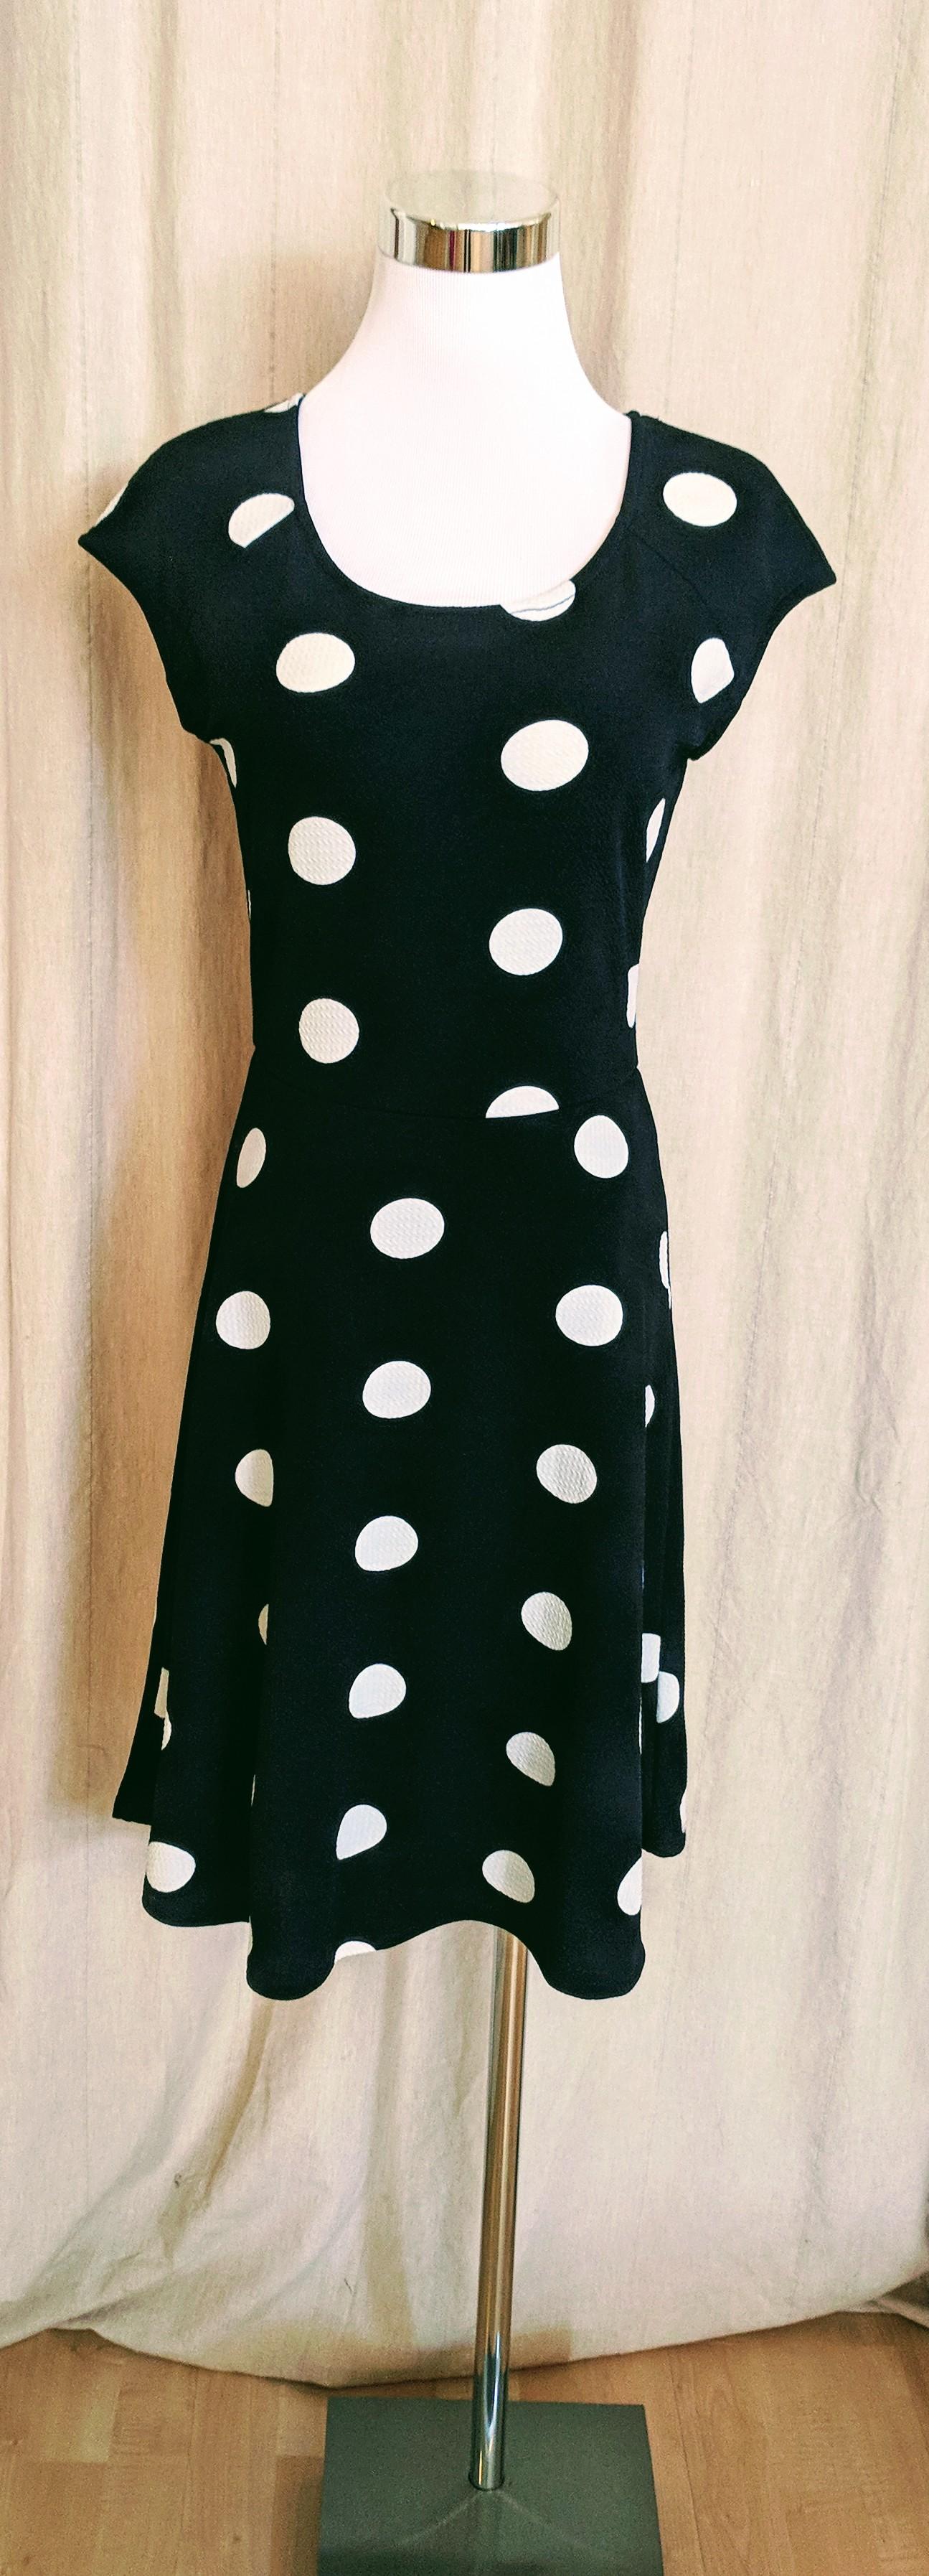 Navy A-line polka dot dress. $42